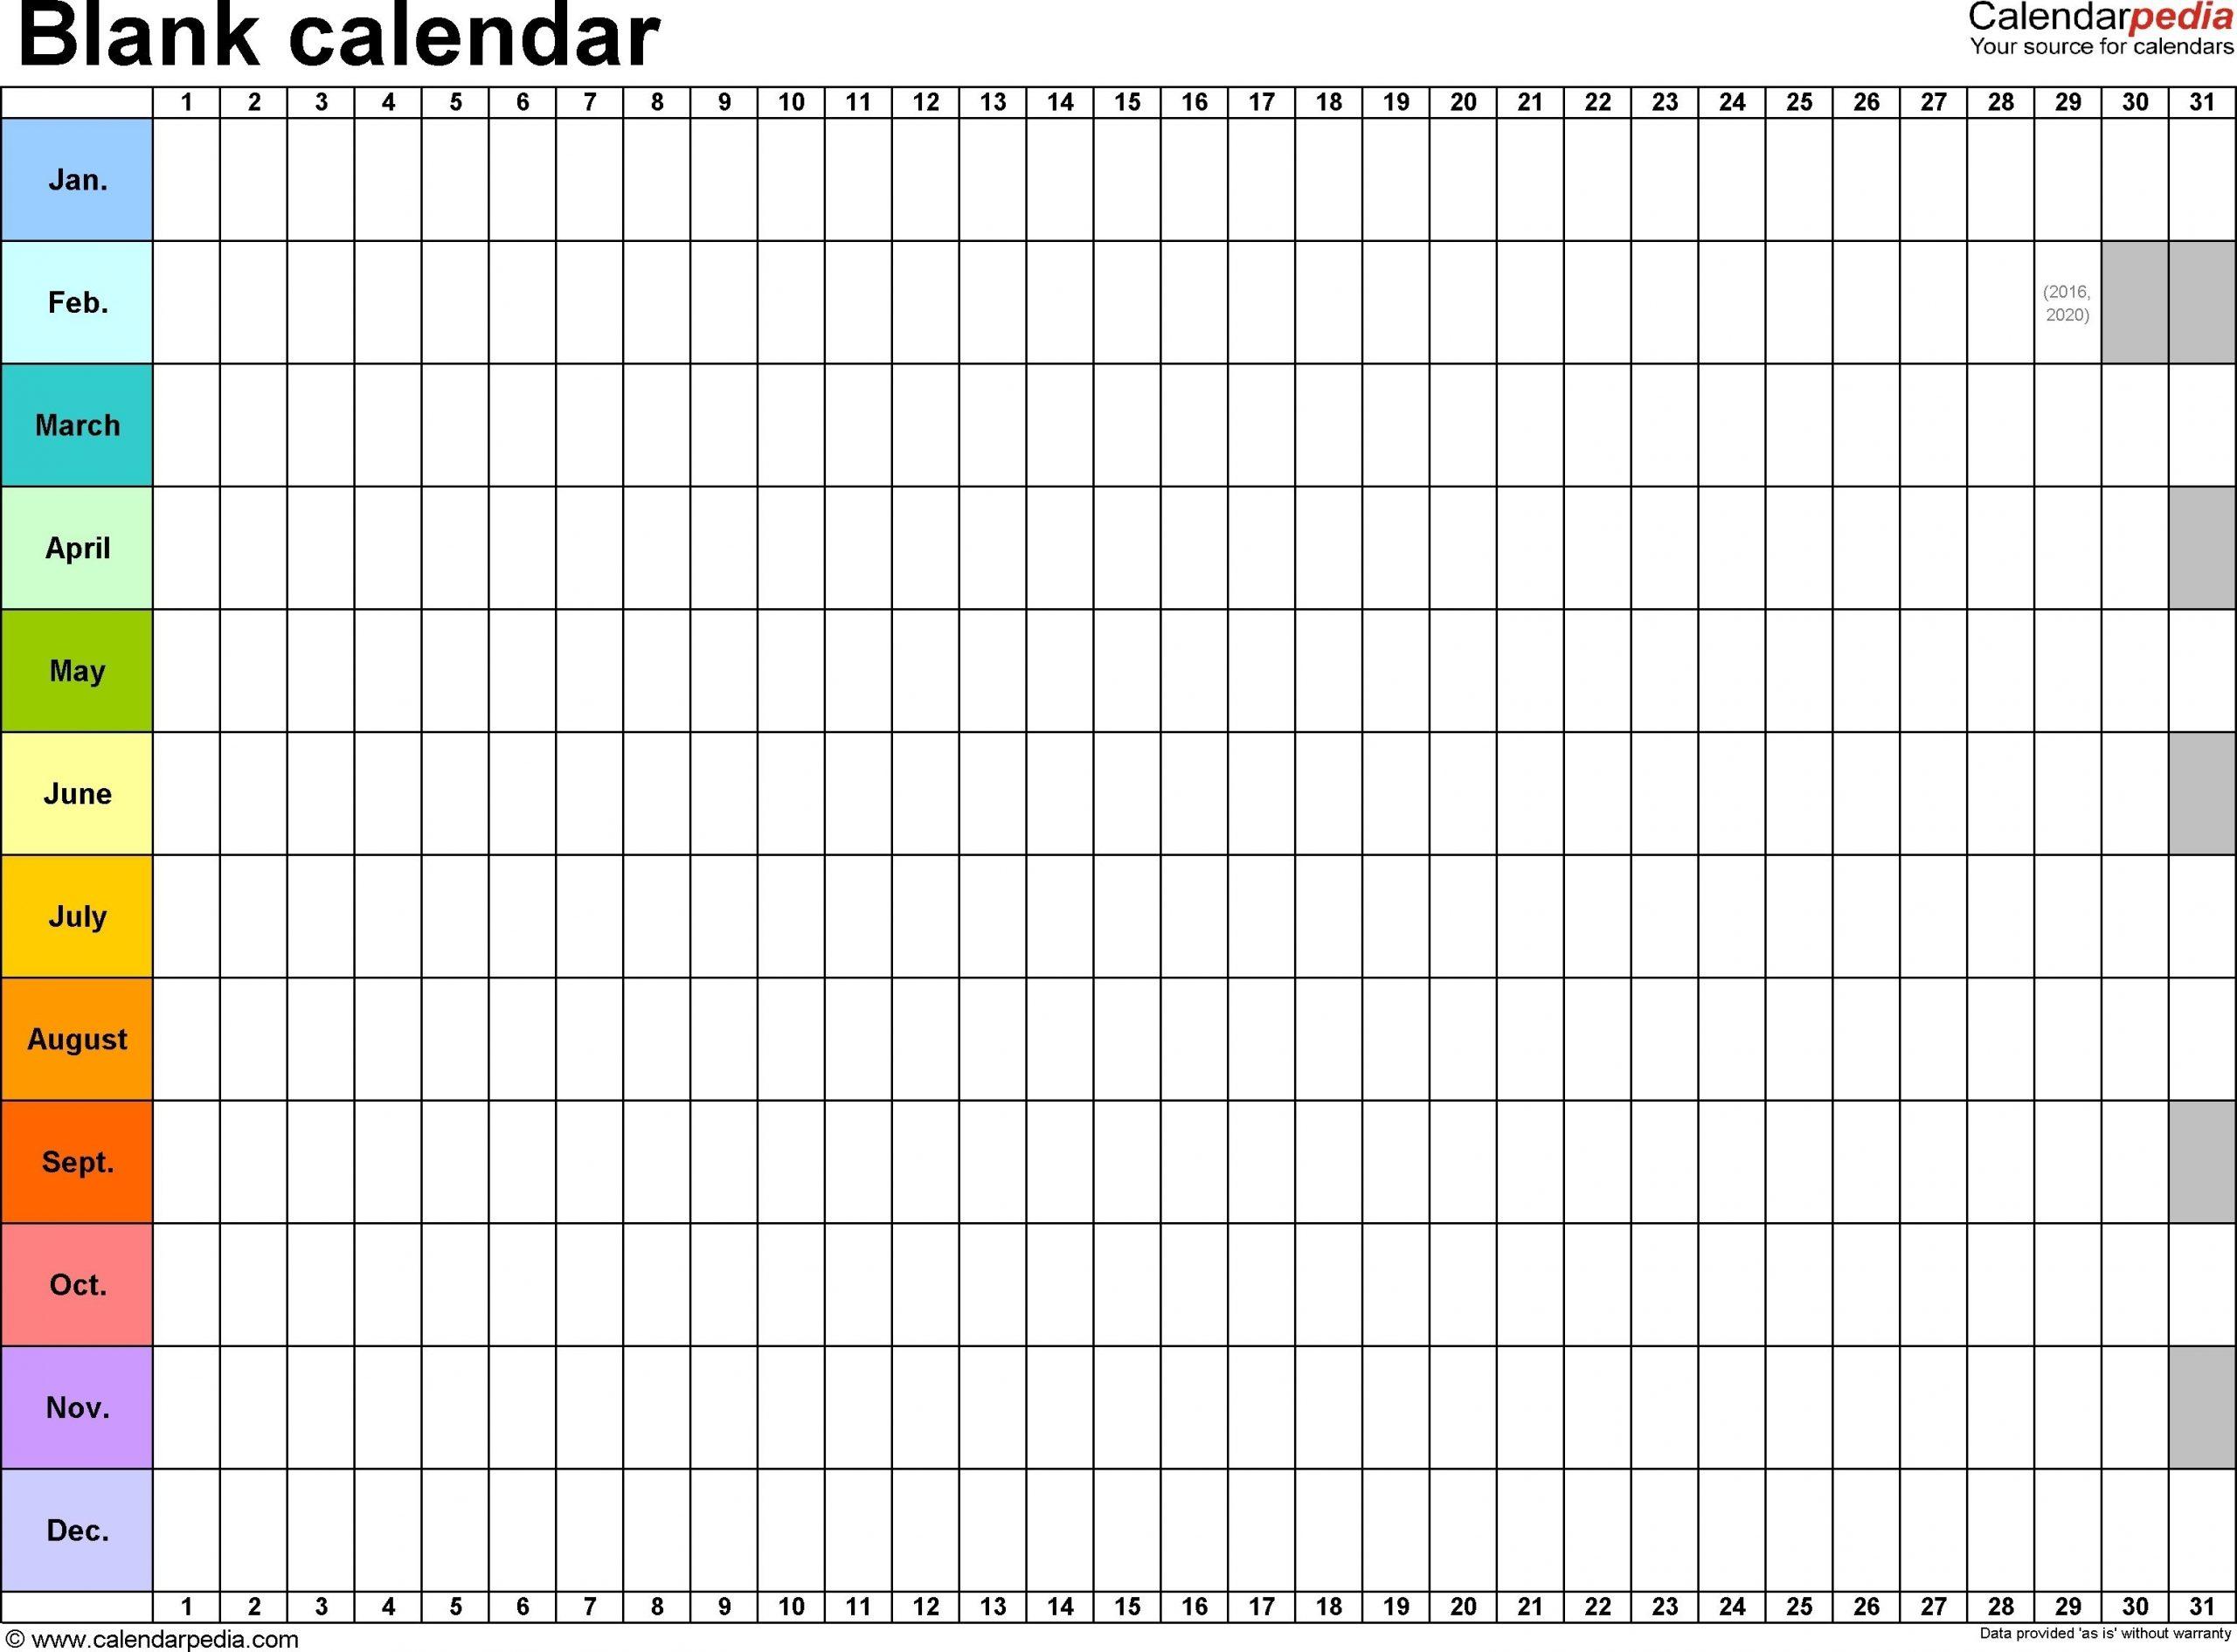 8 X 10 Monthly Calendar In 2020   Excel Calendar Template within 8 X 10 Calendar 2020